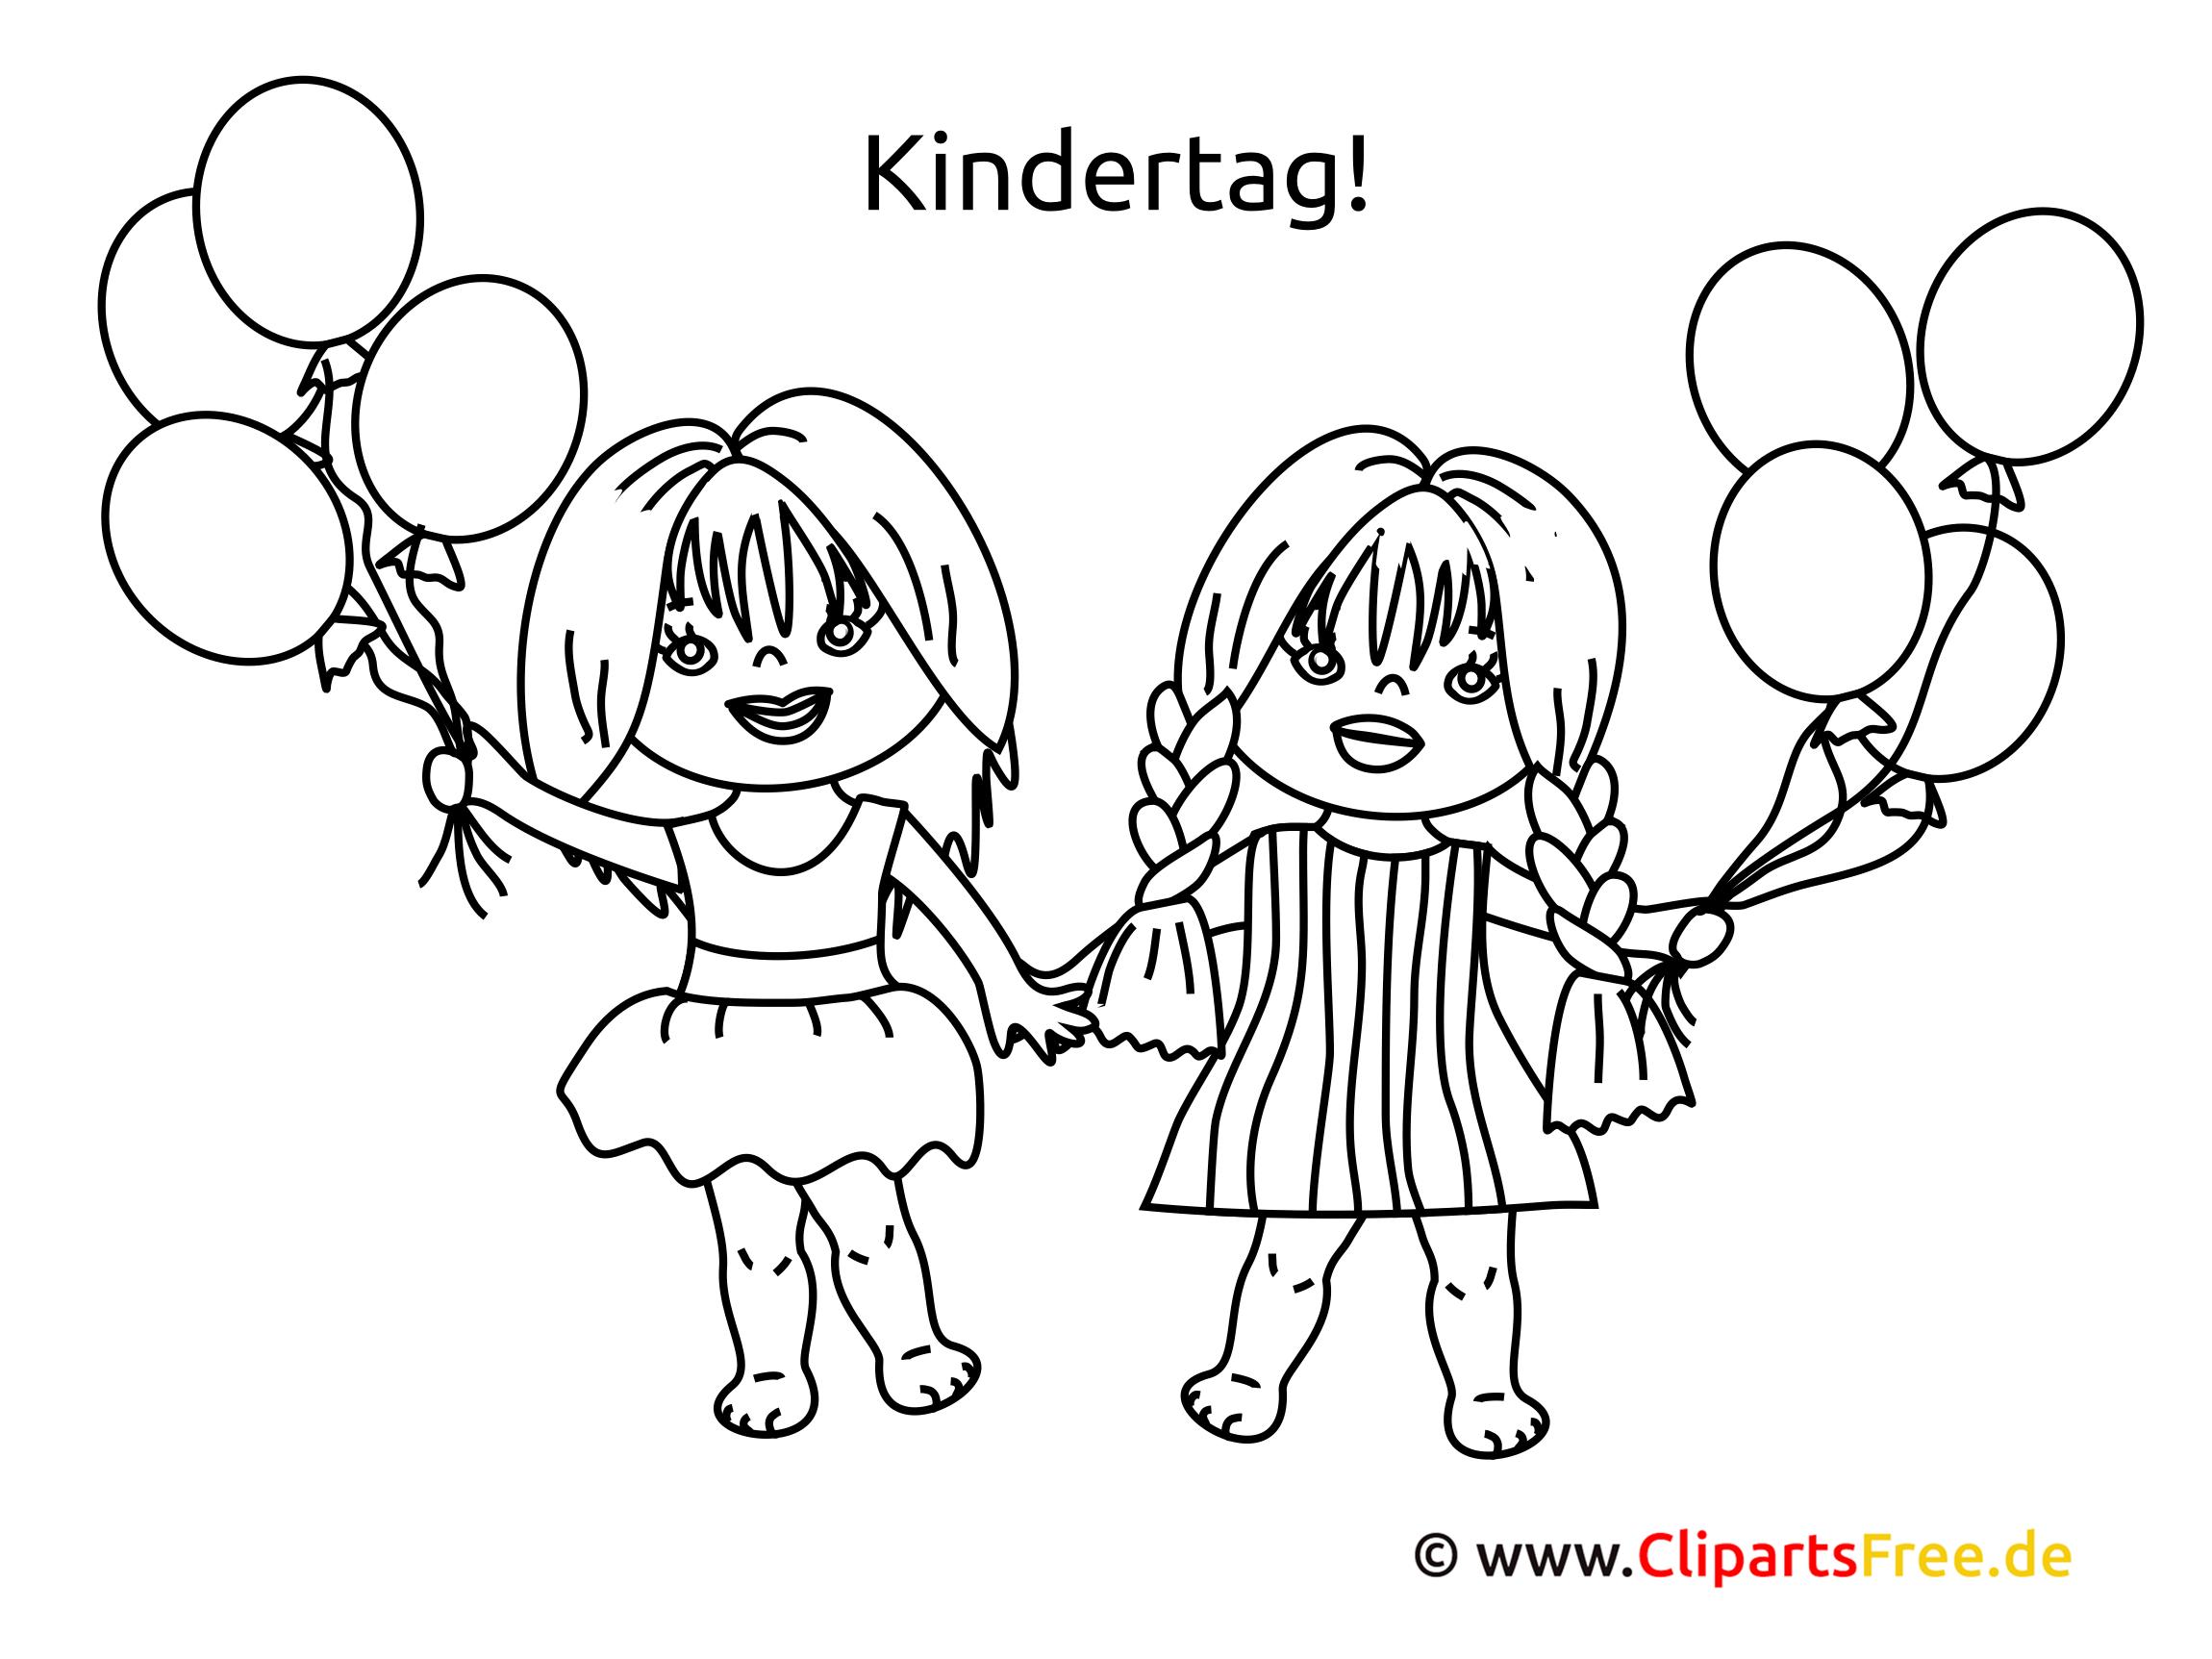 clipart kostenlos kindertag - photo #16